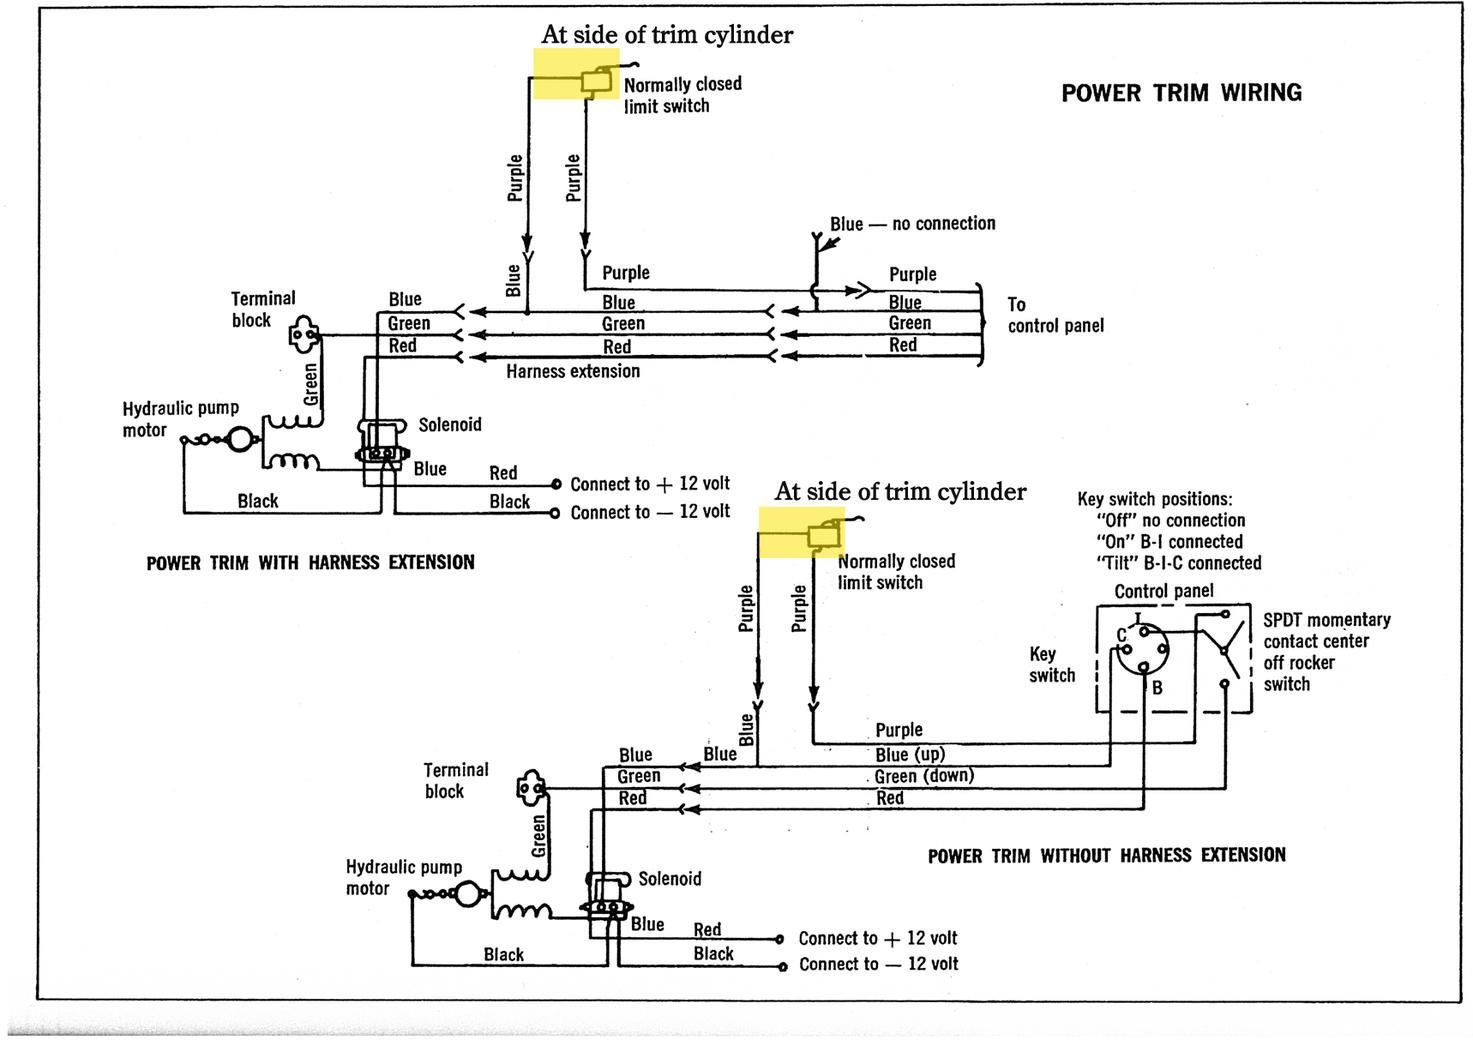 Outstanding Wrg 7792 Merc Wiring Diagram Wiring Cloud Hisonepsysticxongrecoveryedborg